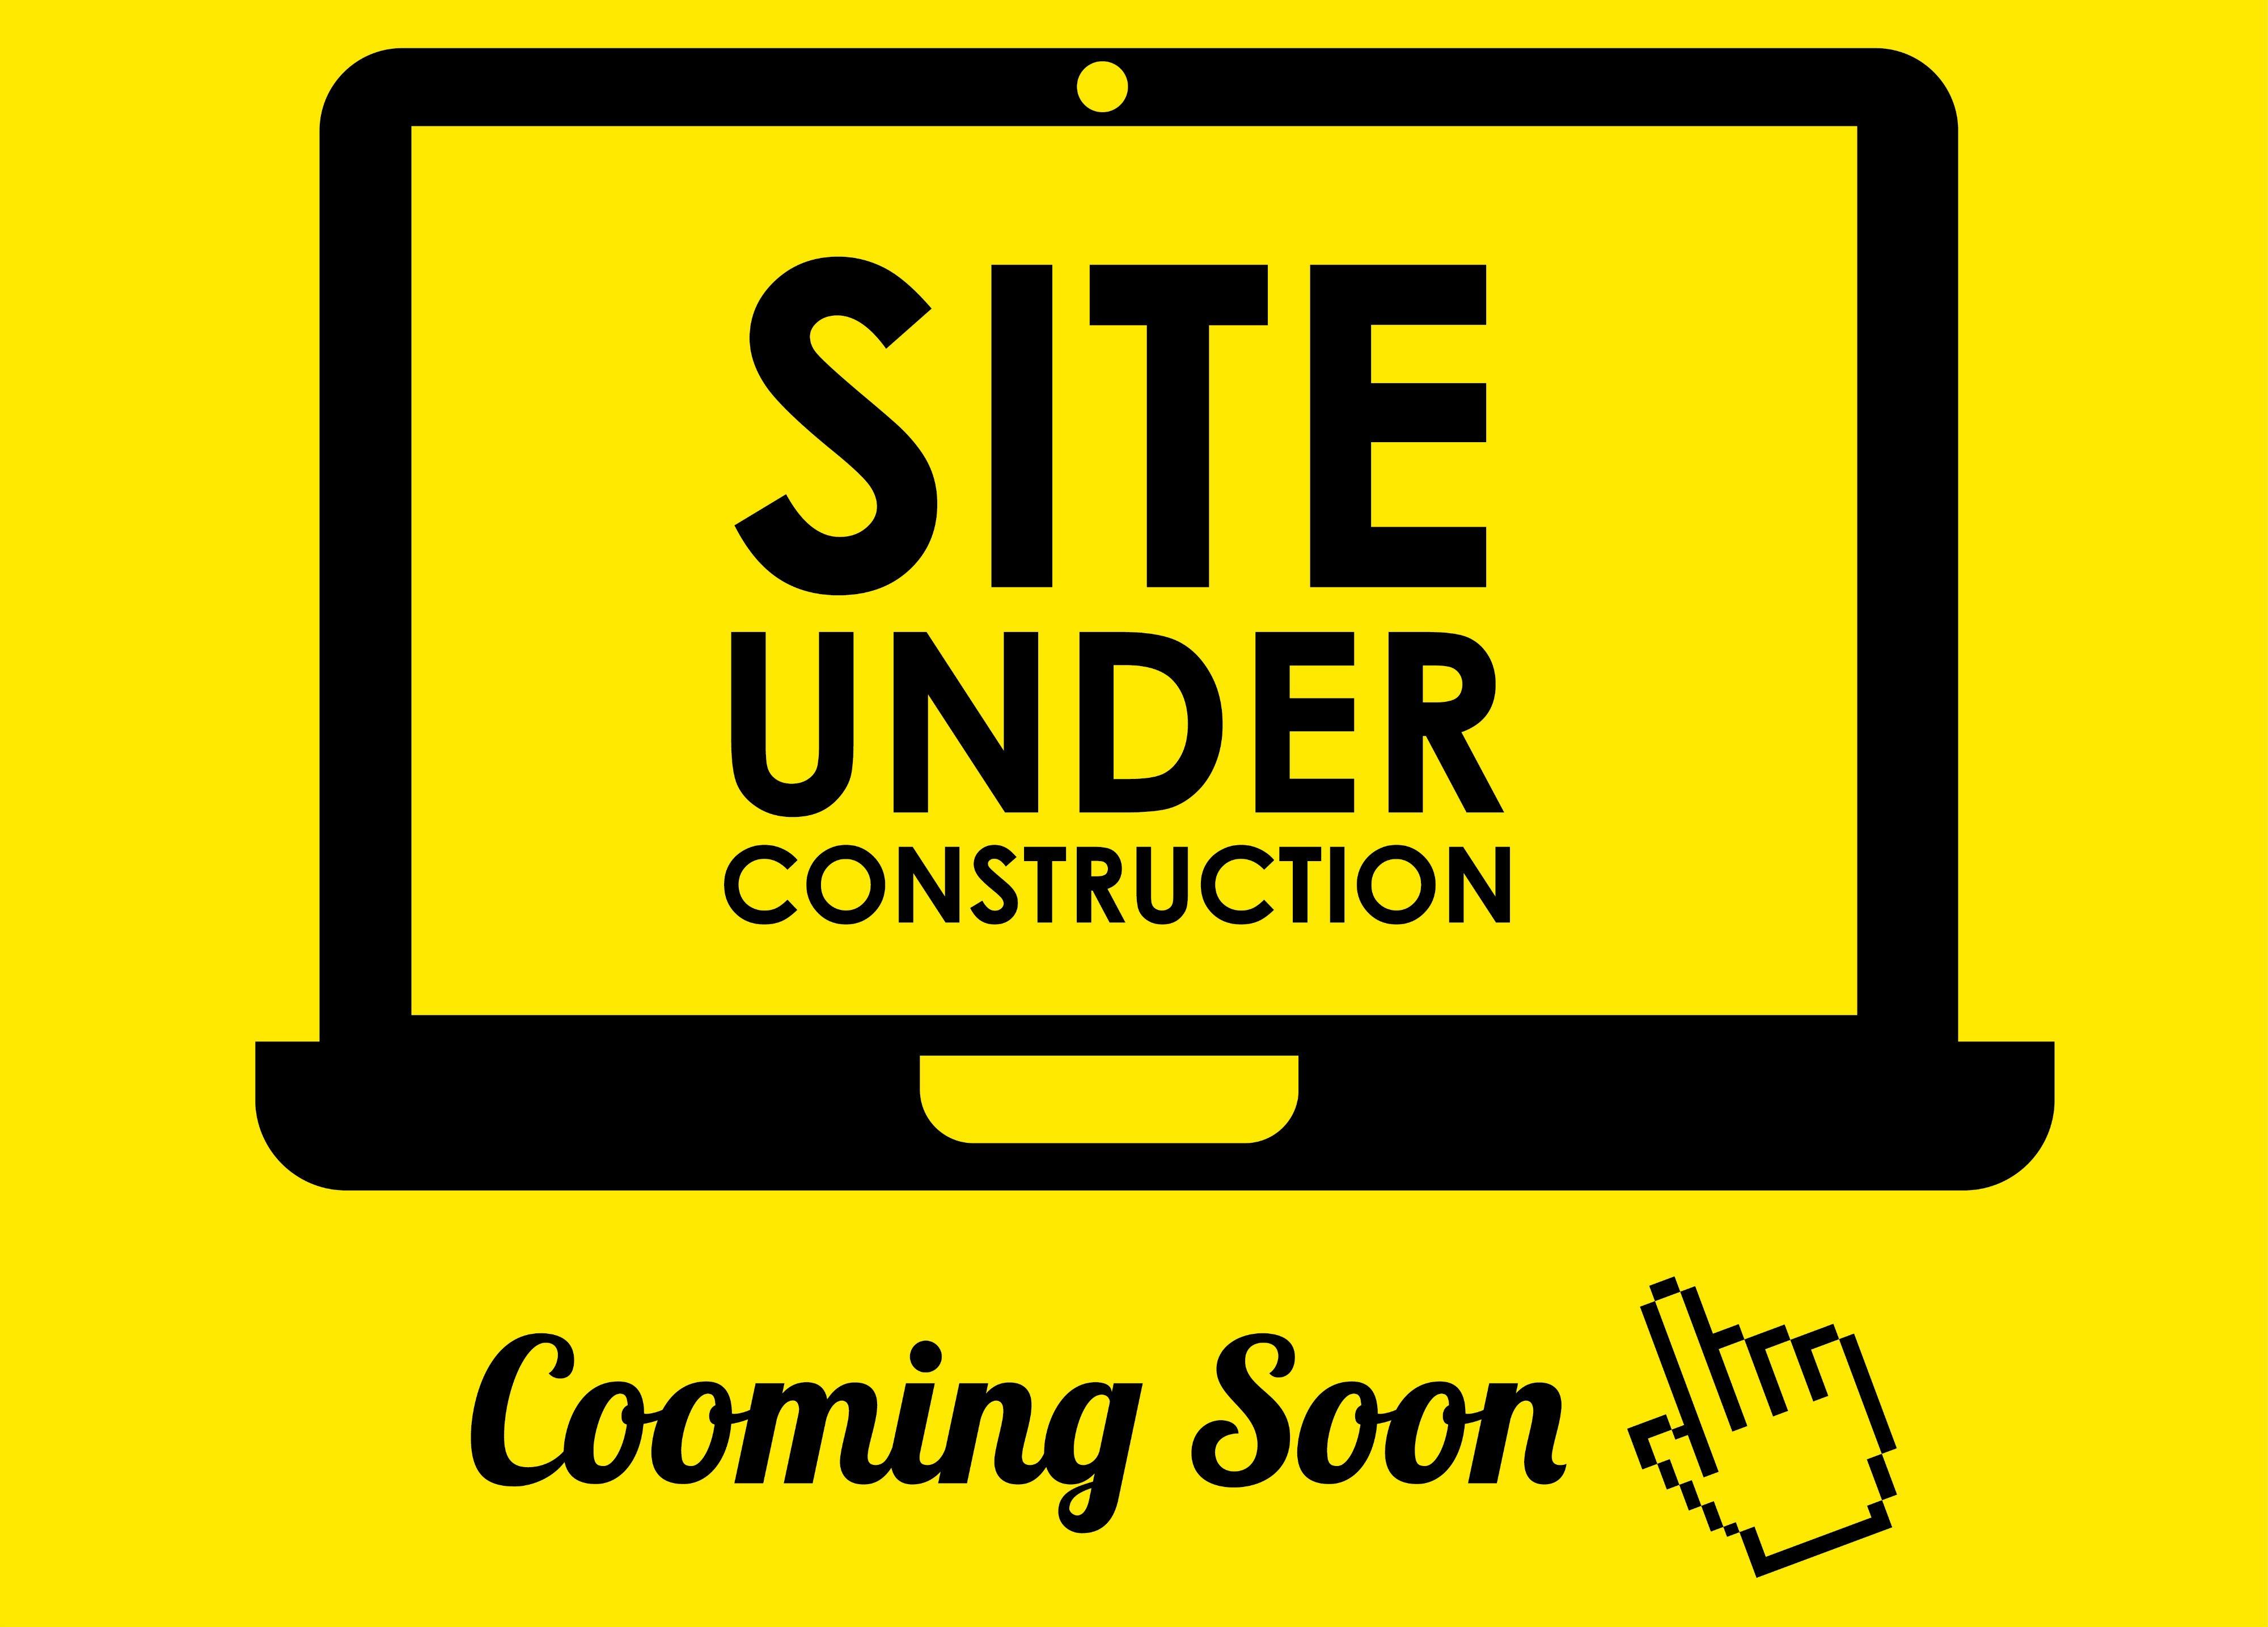 under_construction!